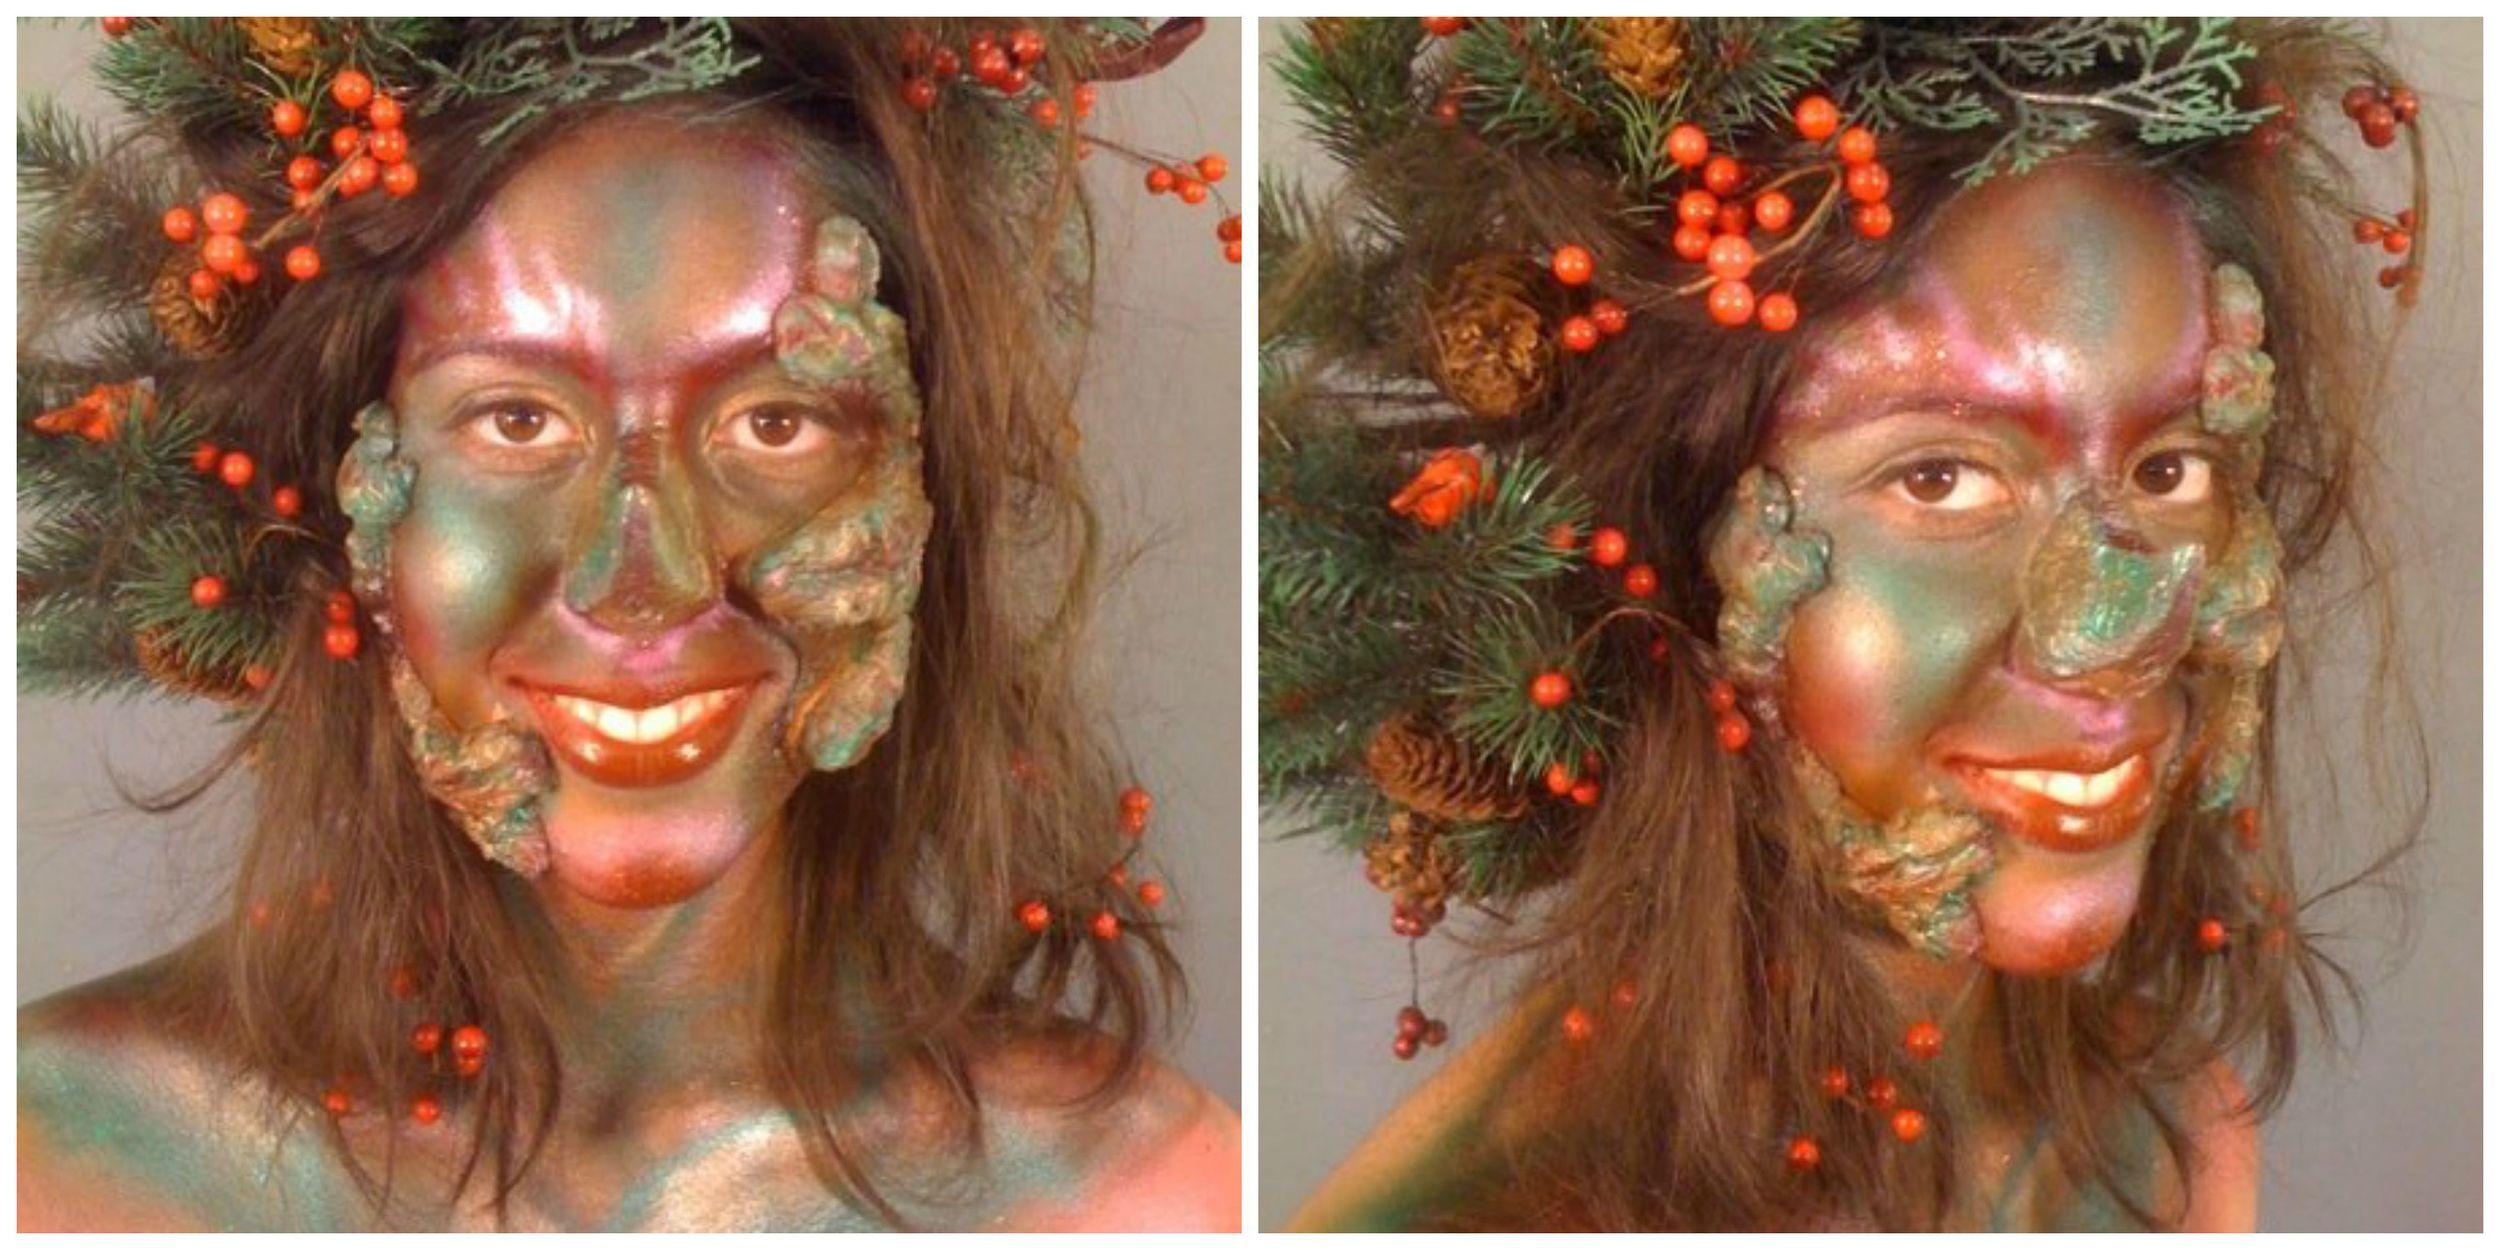 halloween-makeup-woodland-nymph-costume-cosplay.jpg